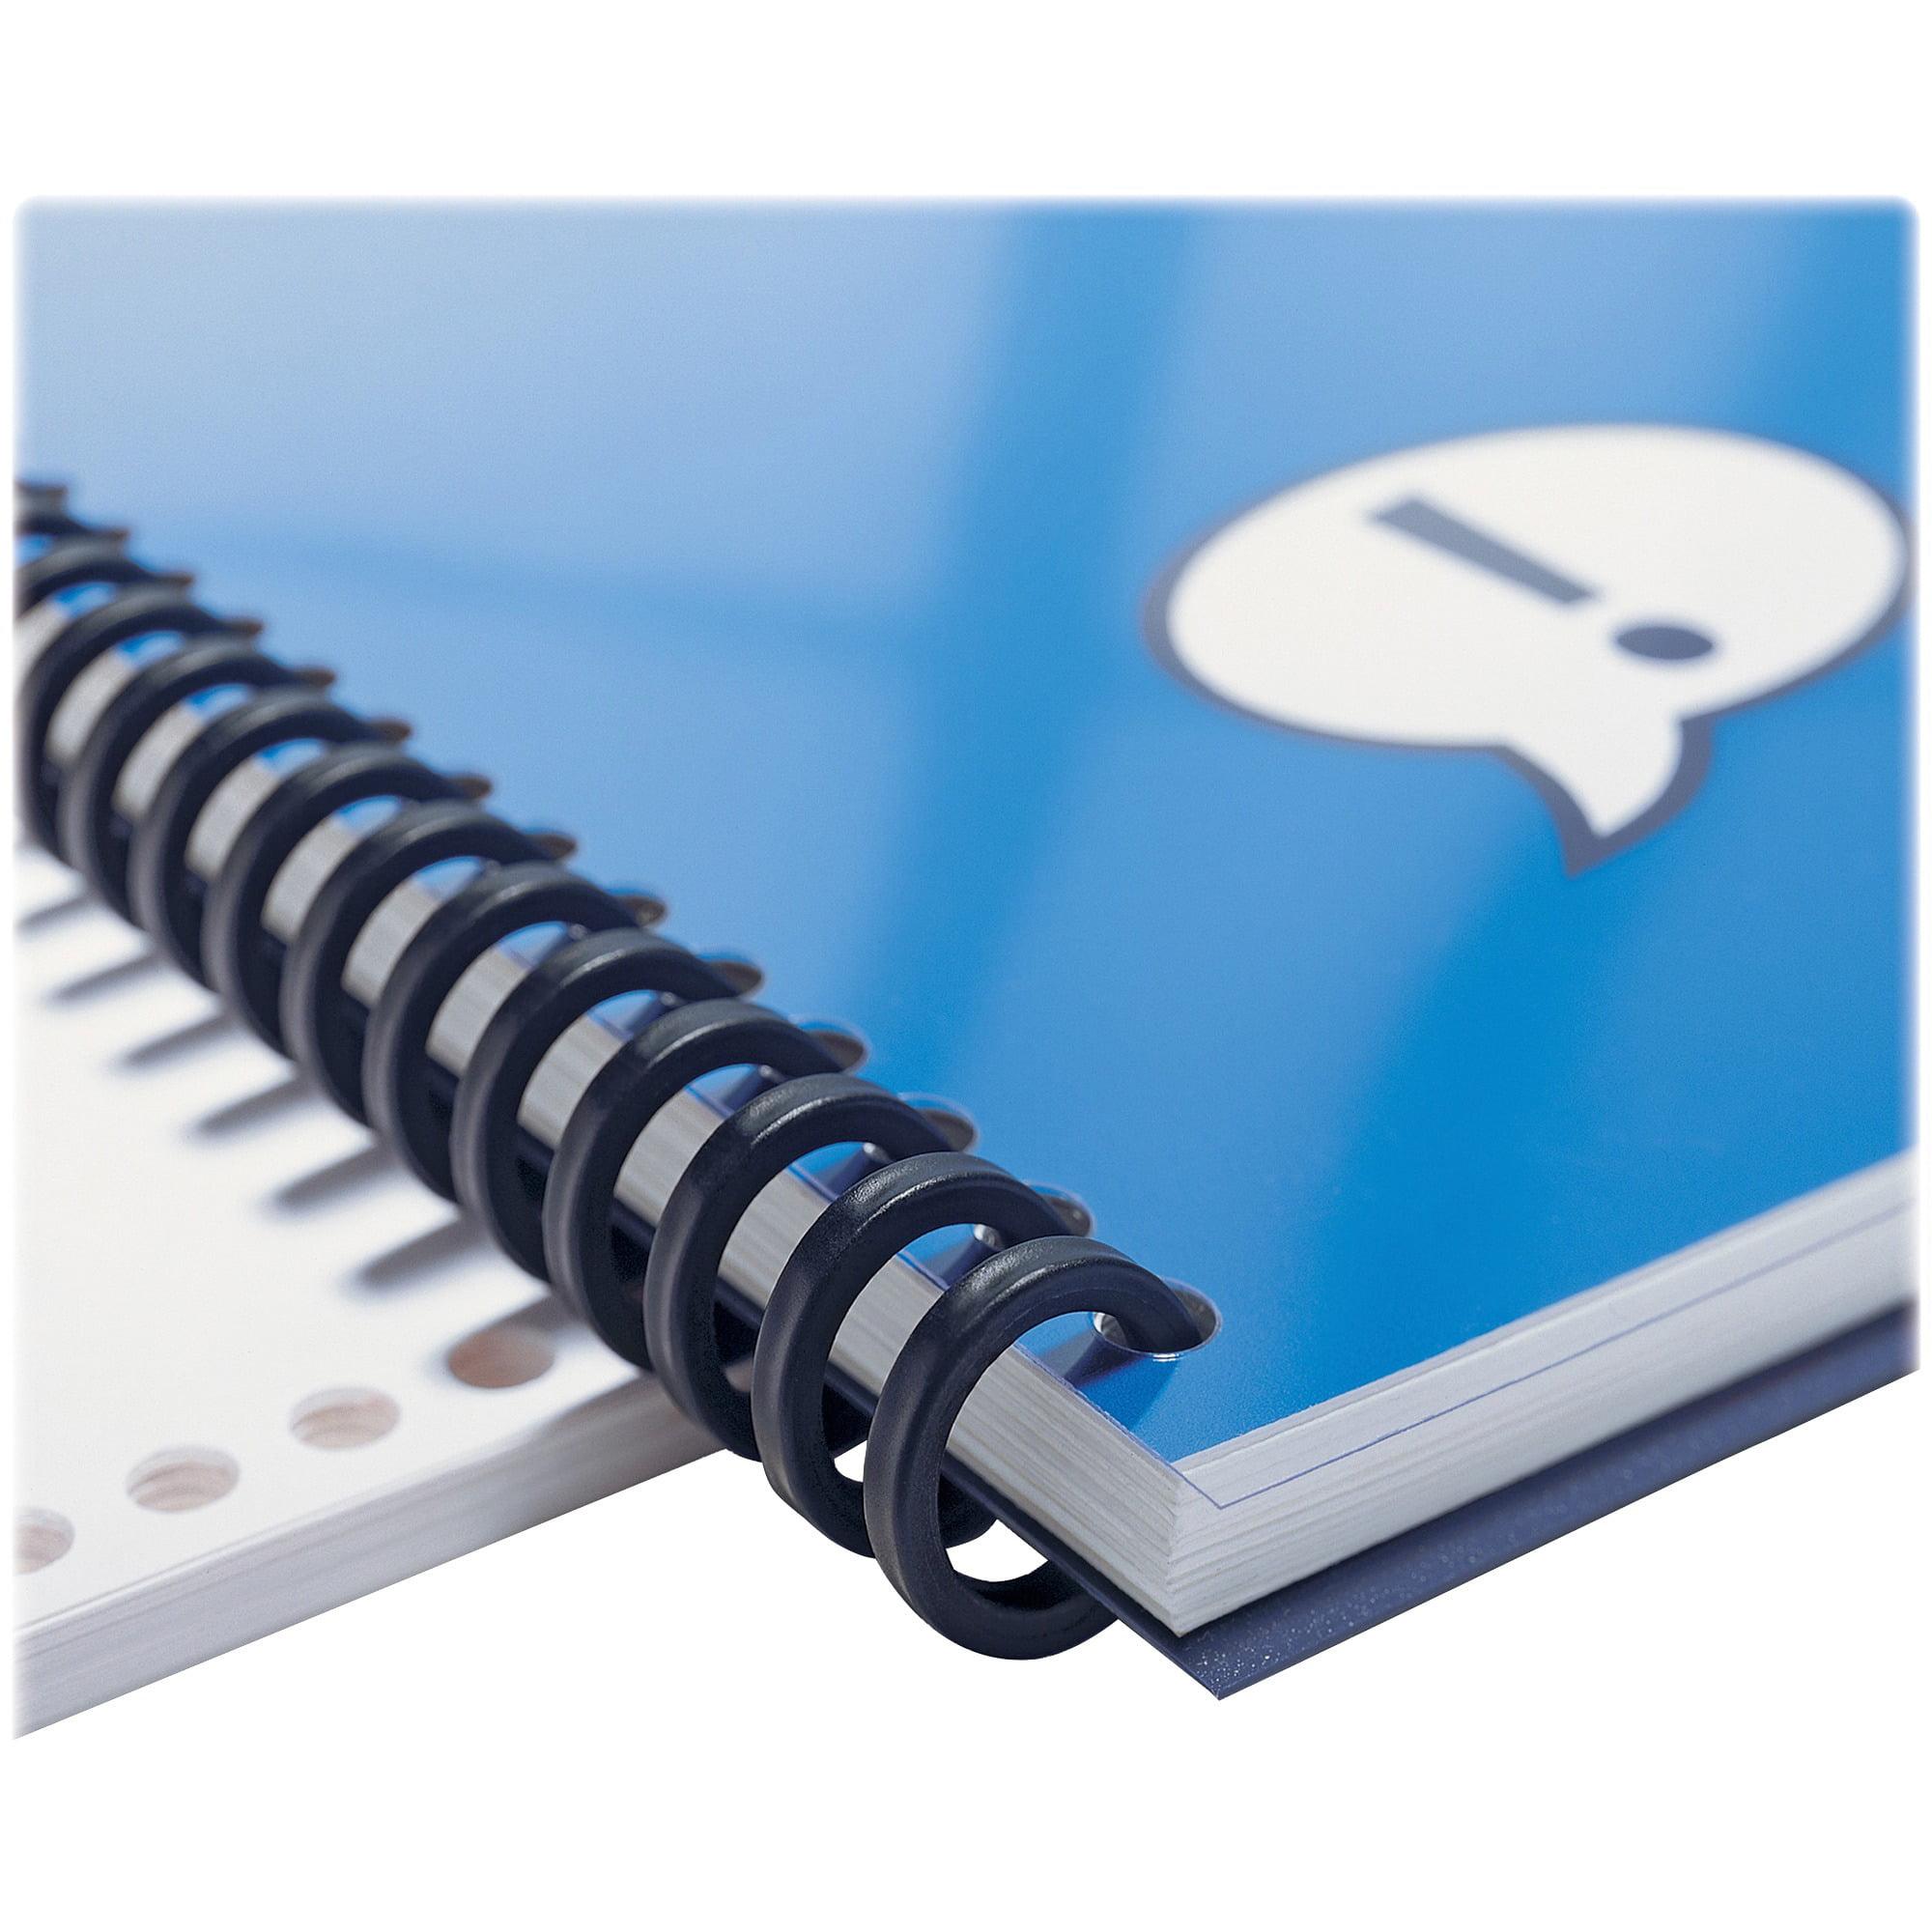 Swingline GBC, SWI2514517, ProClick Binding Spines, 100 / Box, Black